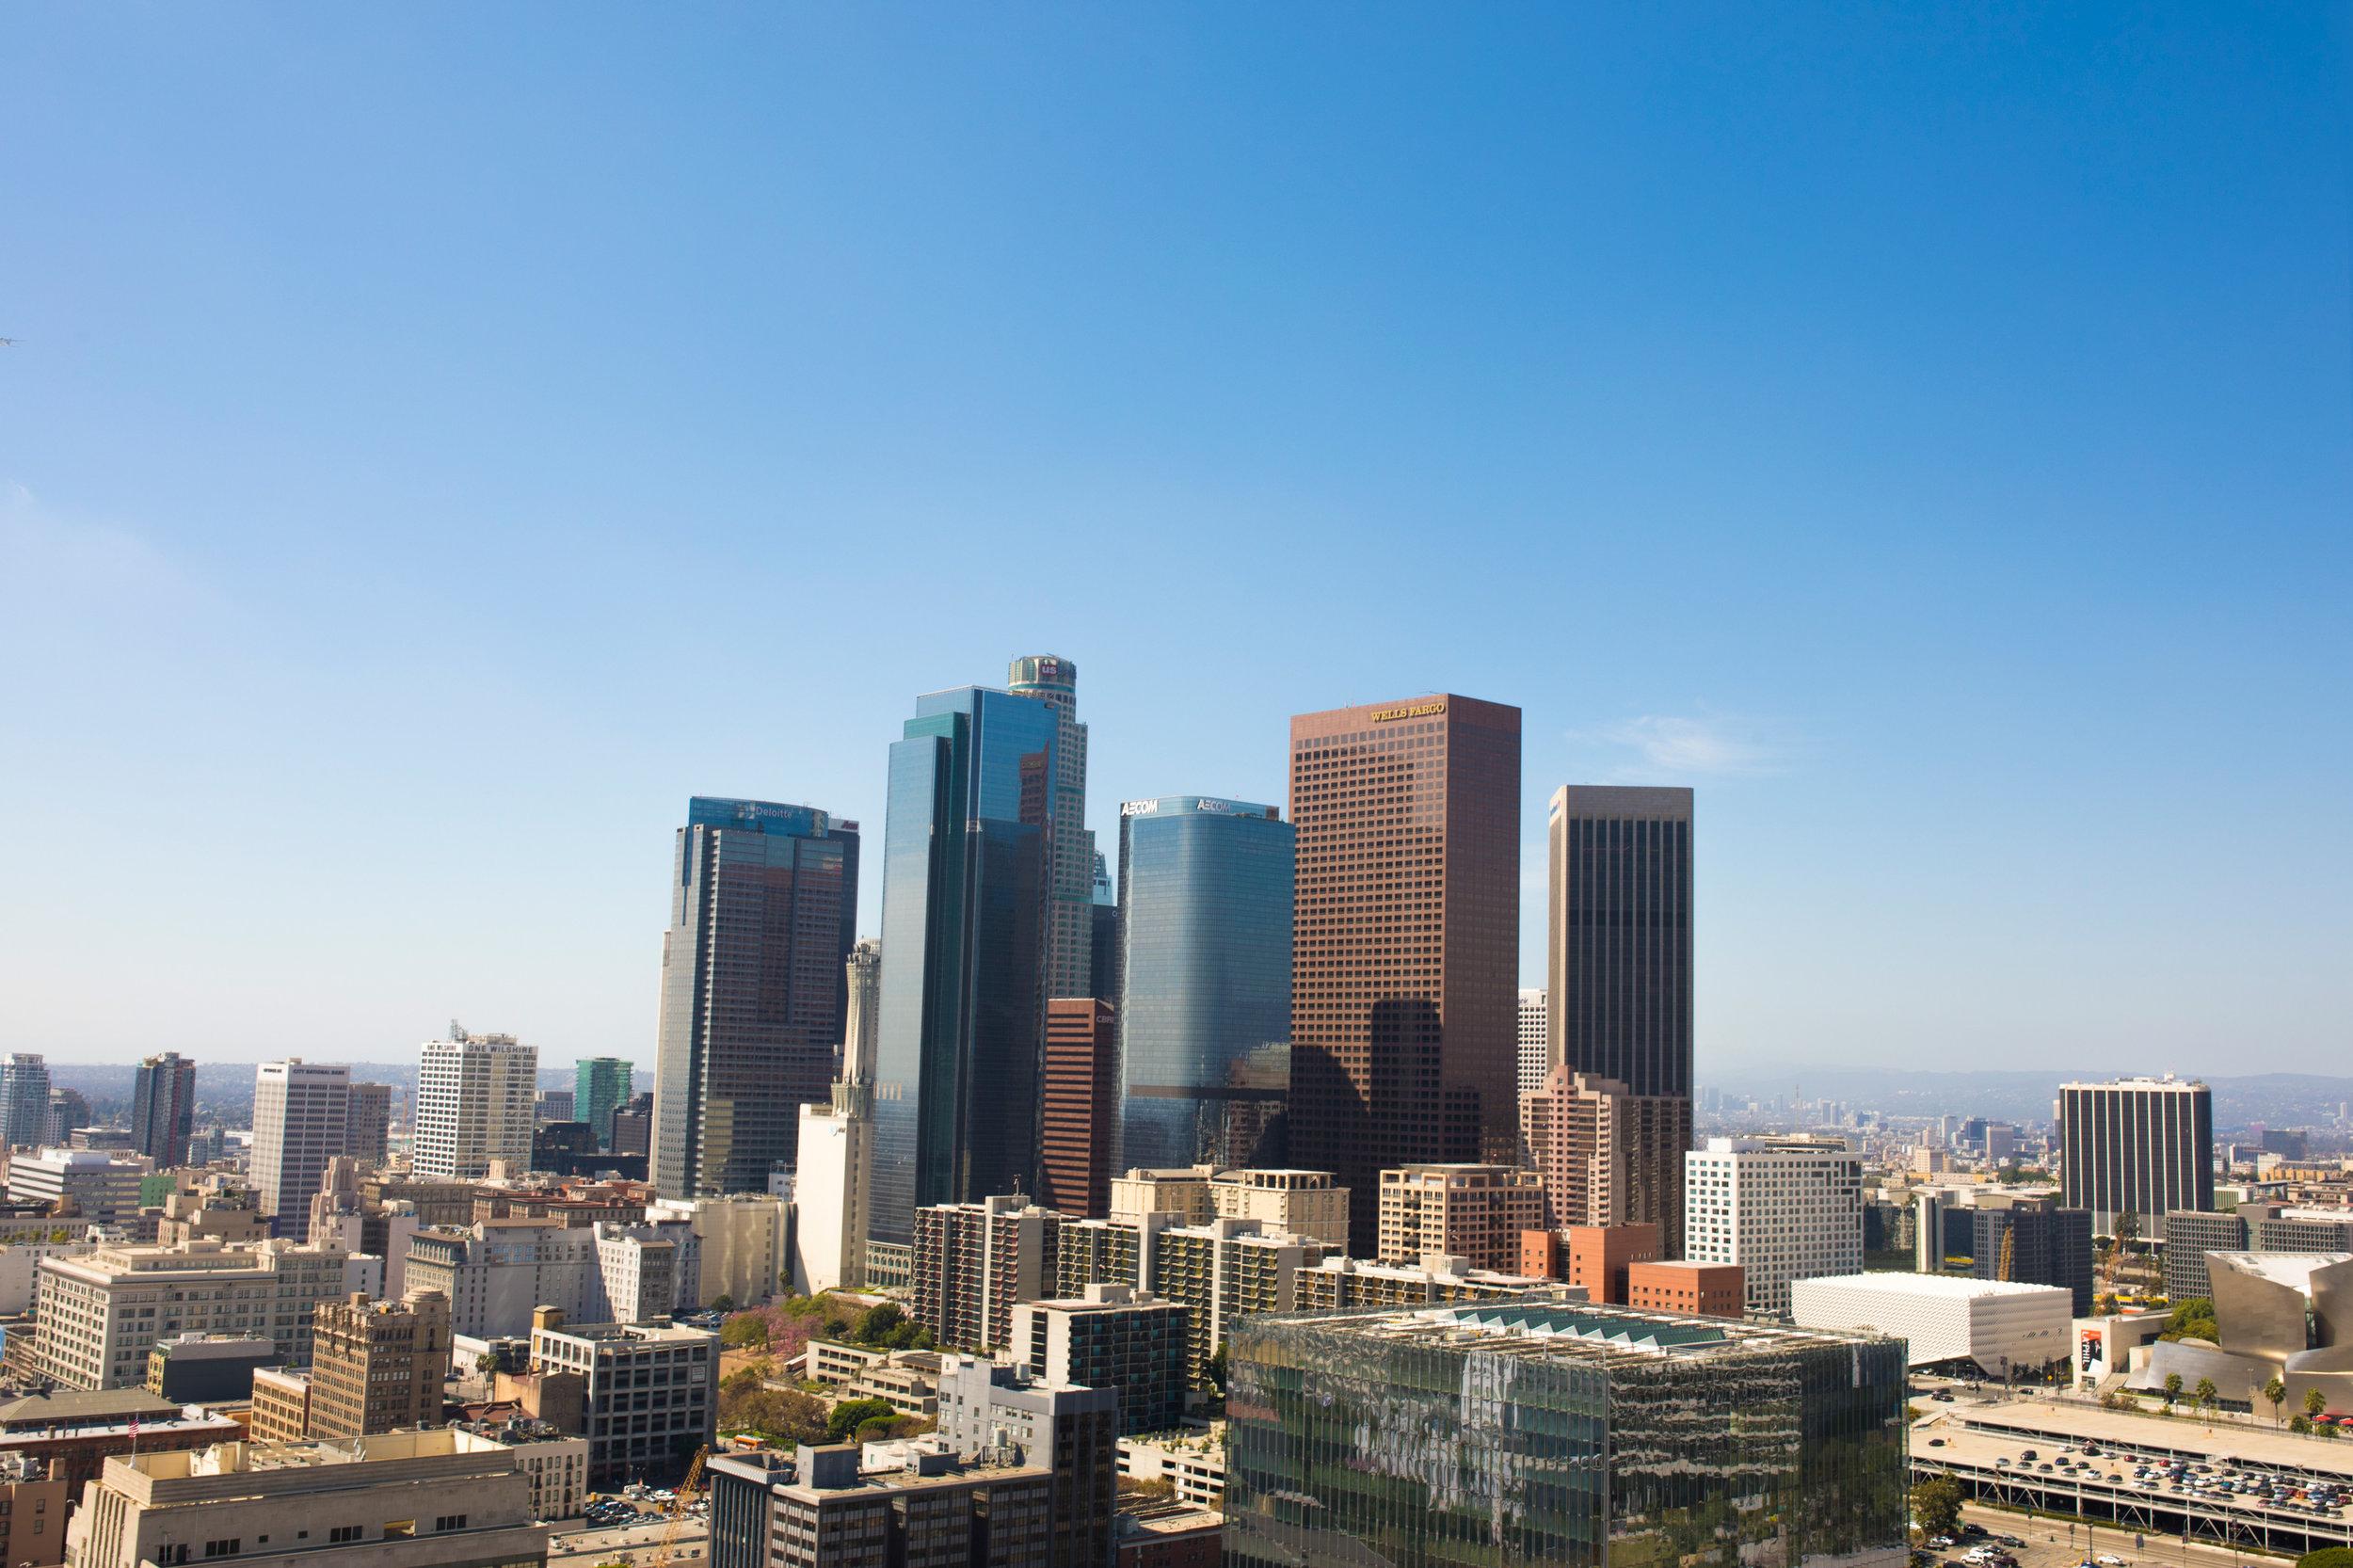 Downtown LA cityscape view photography